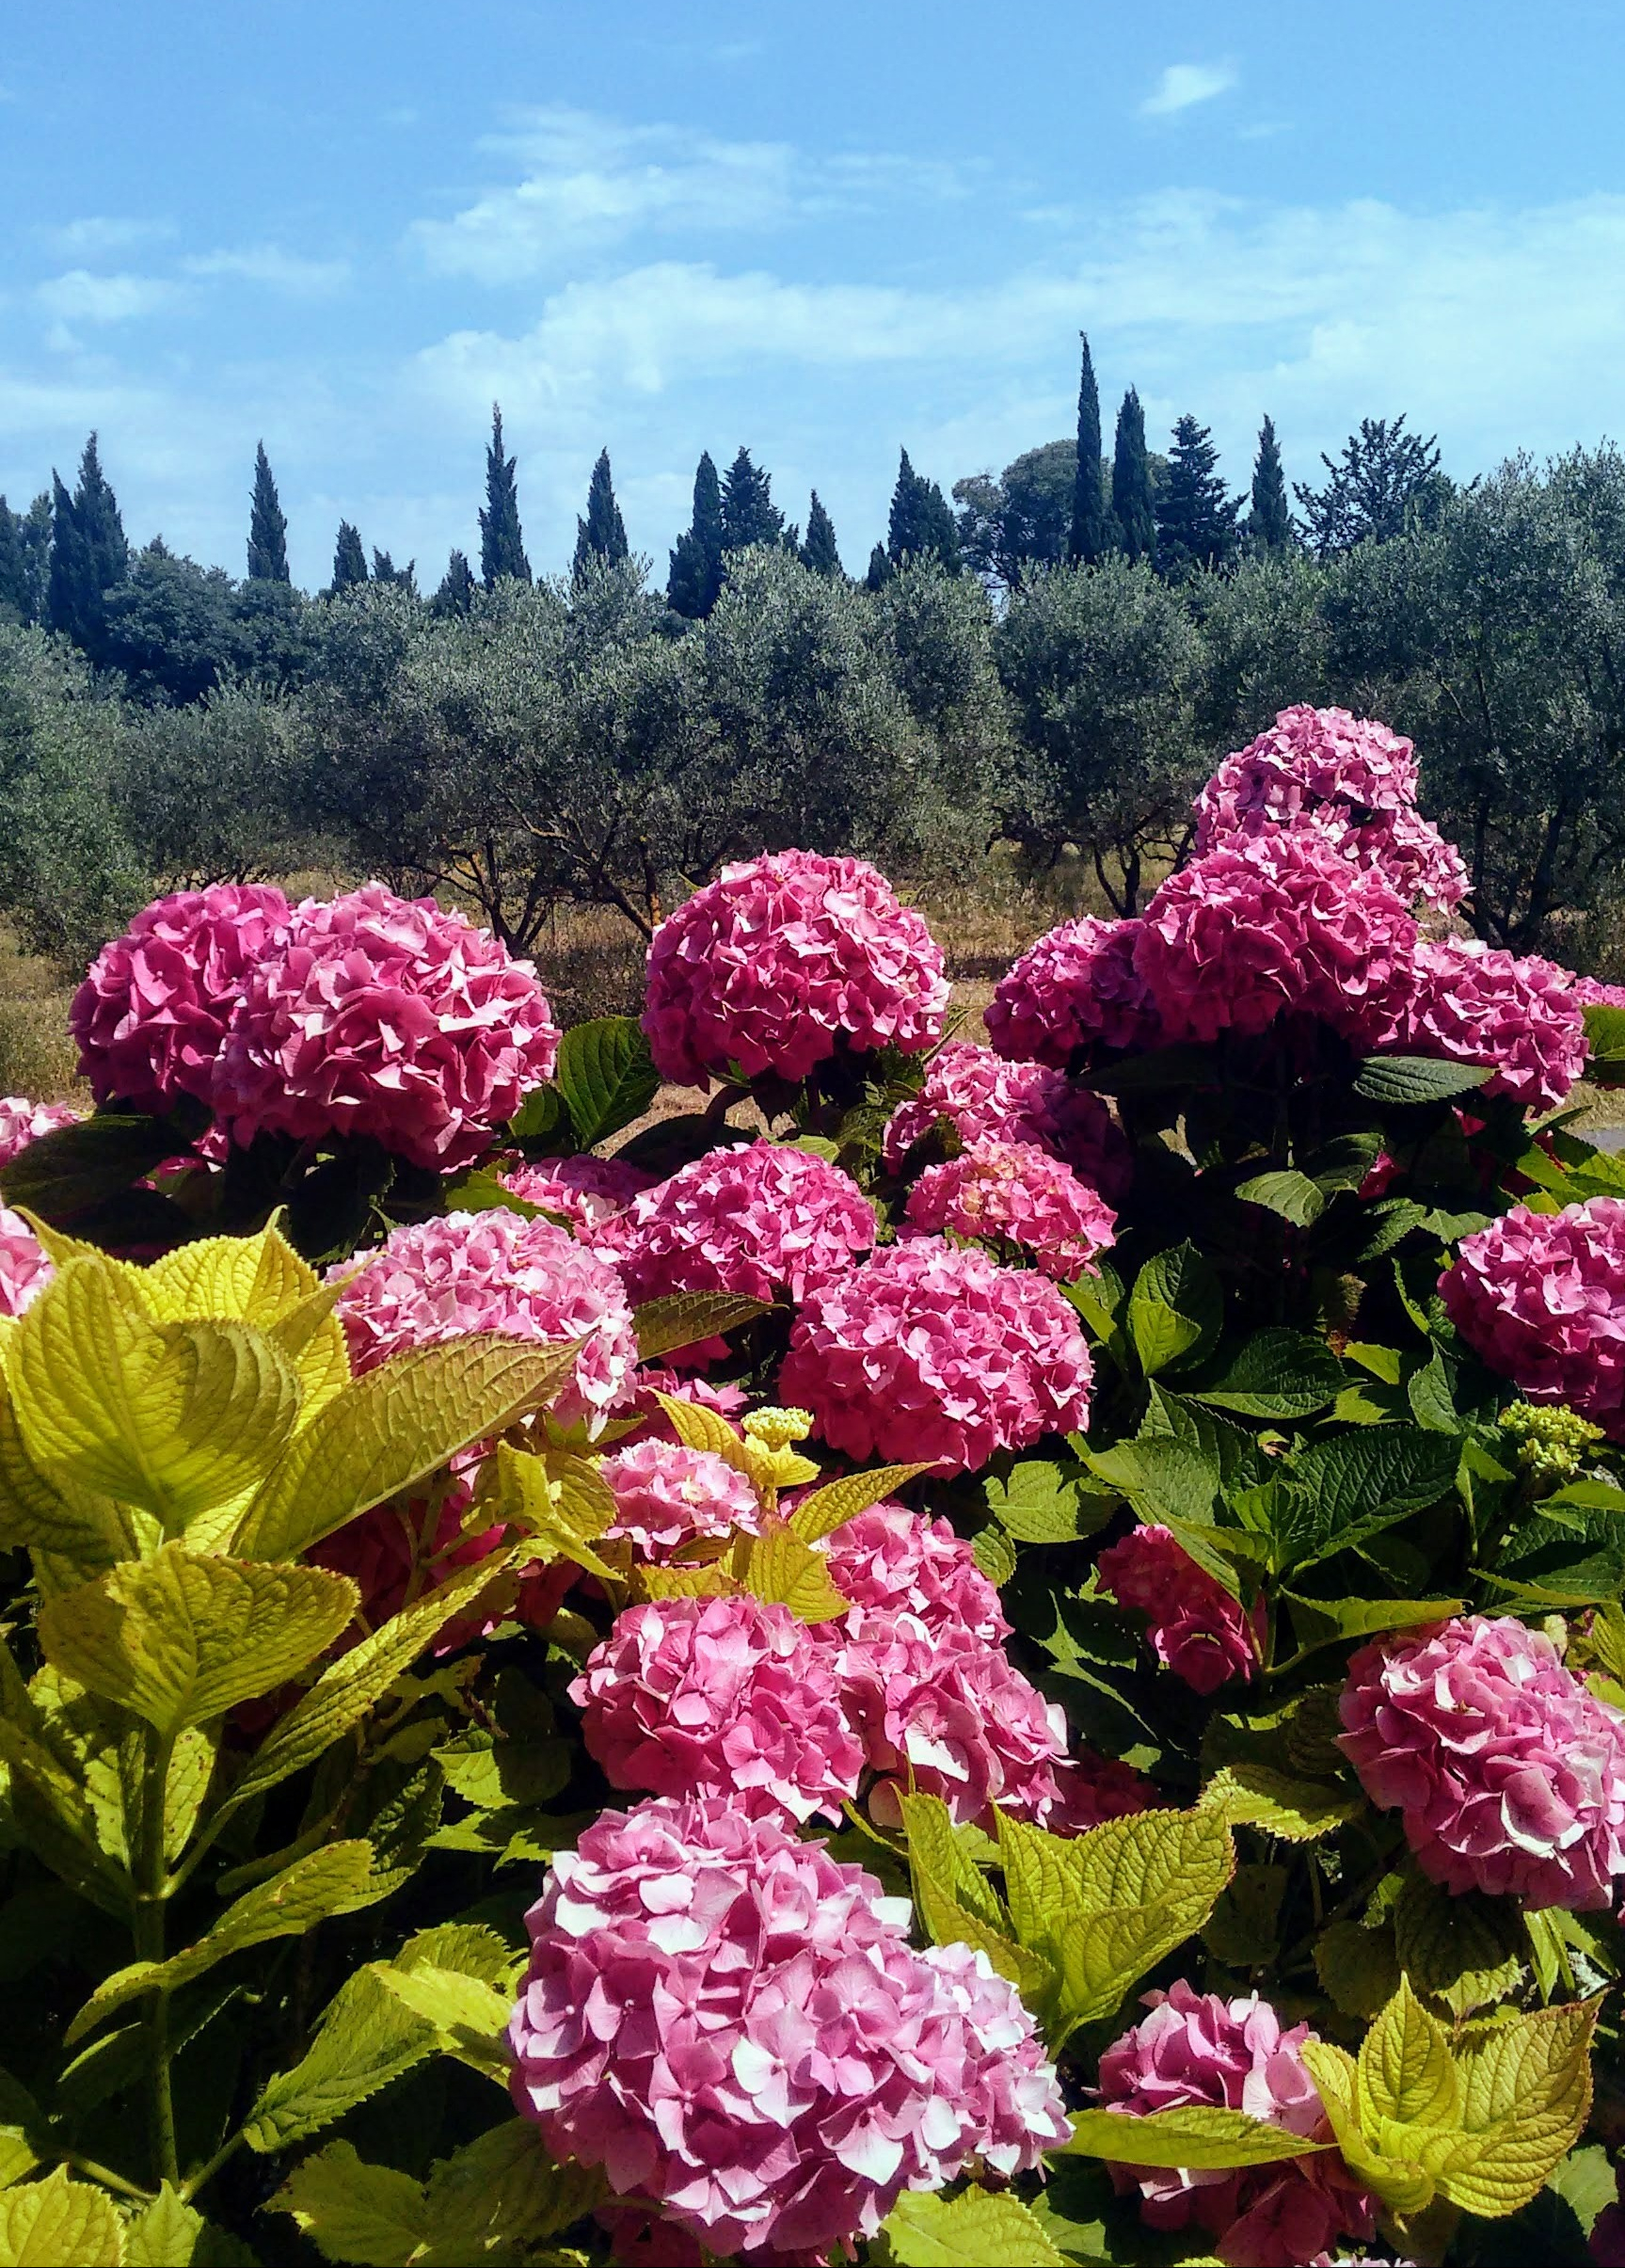 Hot pink hydrangeas shout summer in St. Remy.